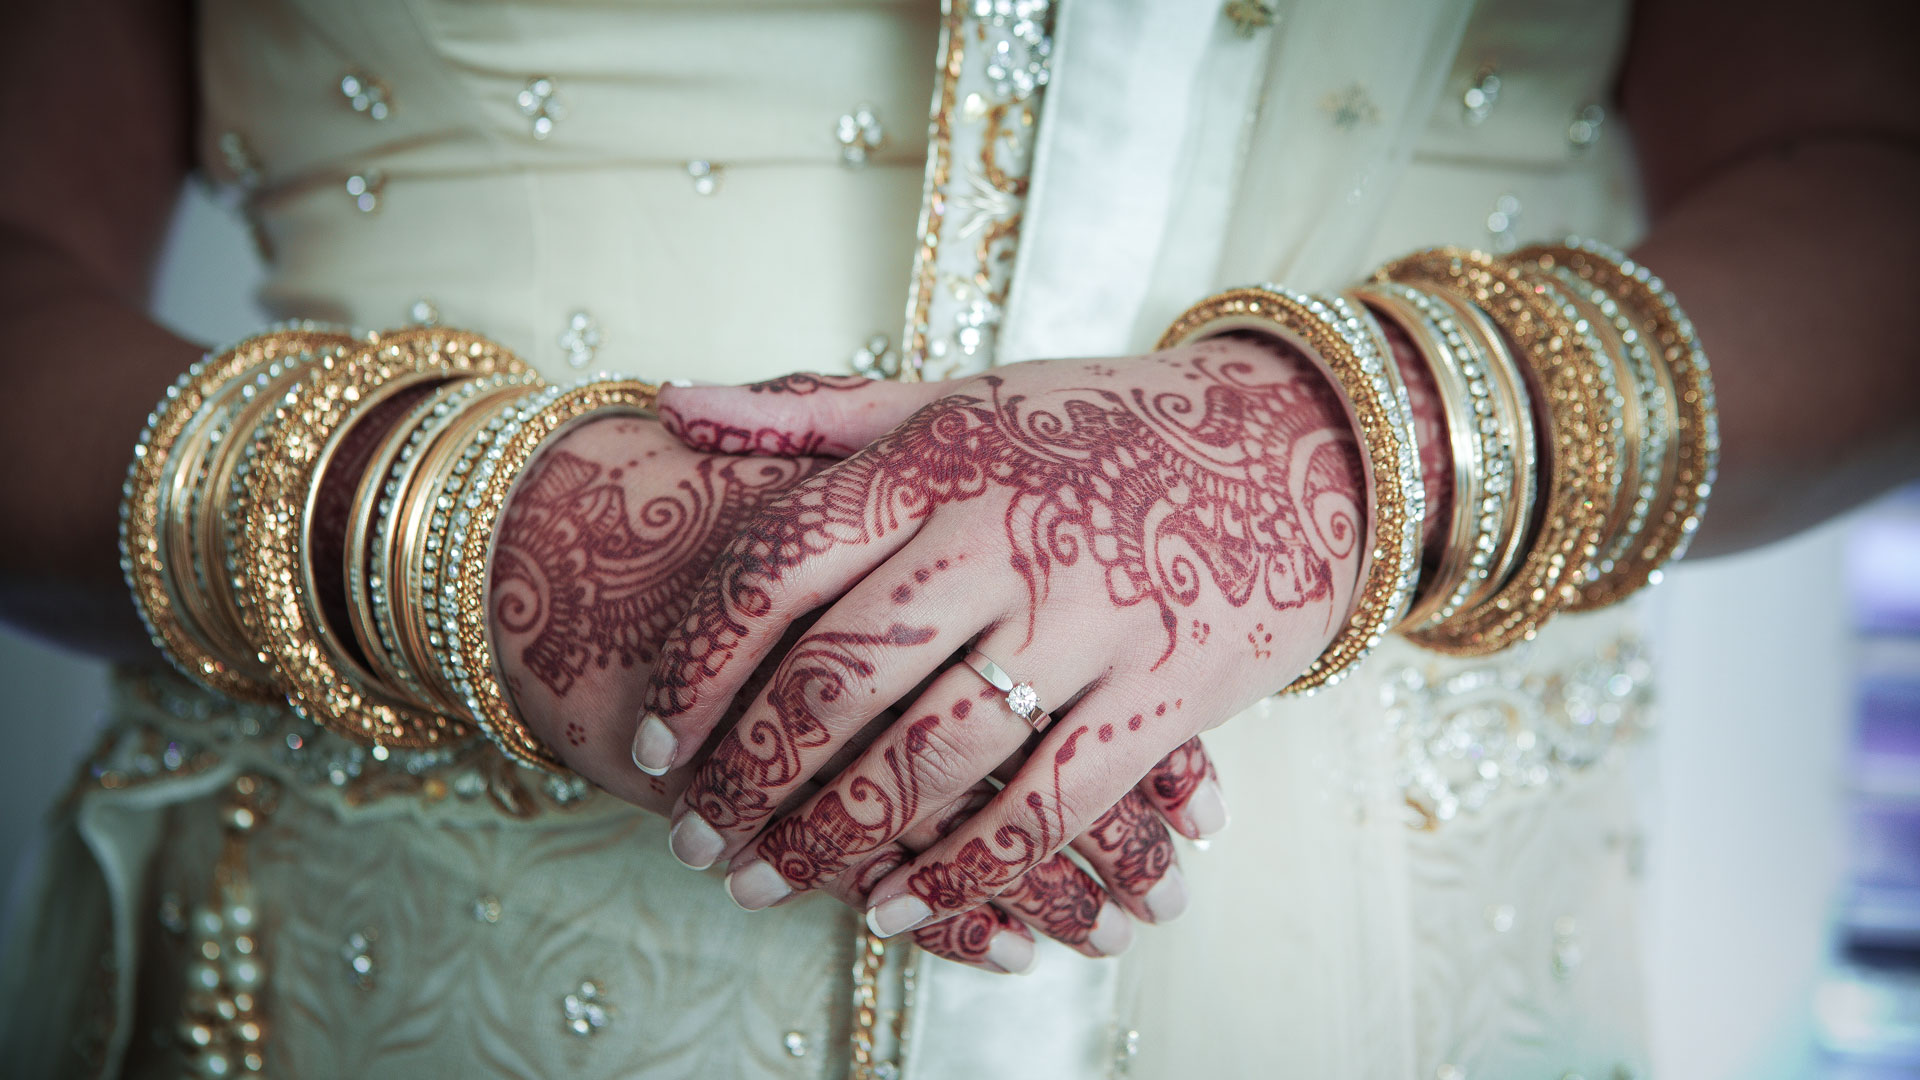 epic_sky_pictures_bride_wedding_ring_diamond_shoot_happyday_weddingshoot_romantic_love_vancouver_toronto_canada_weddingday_wedding_wedding_henna_epicskypictures_site